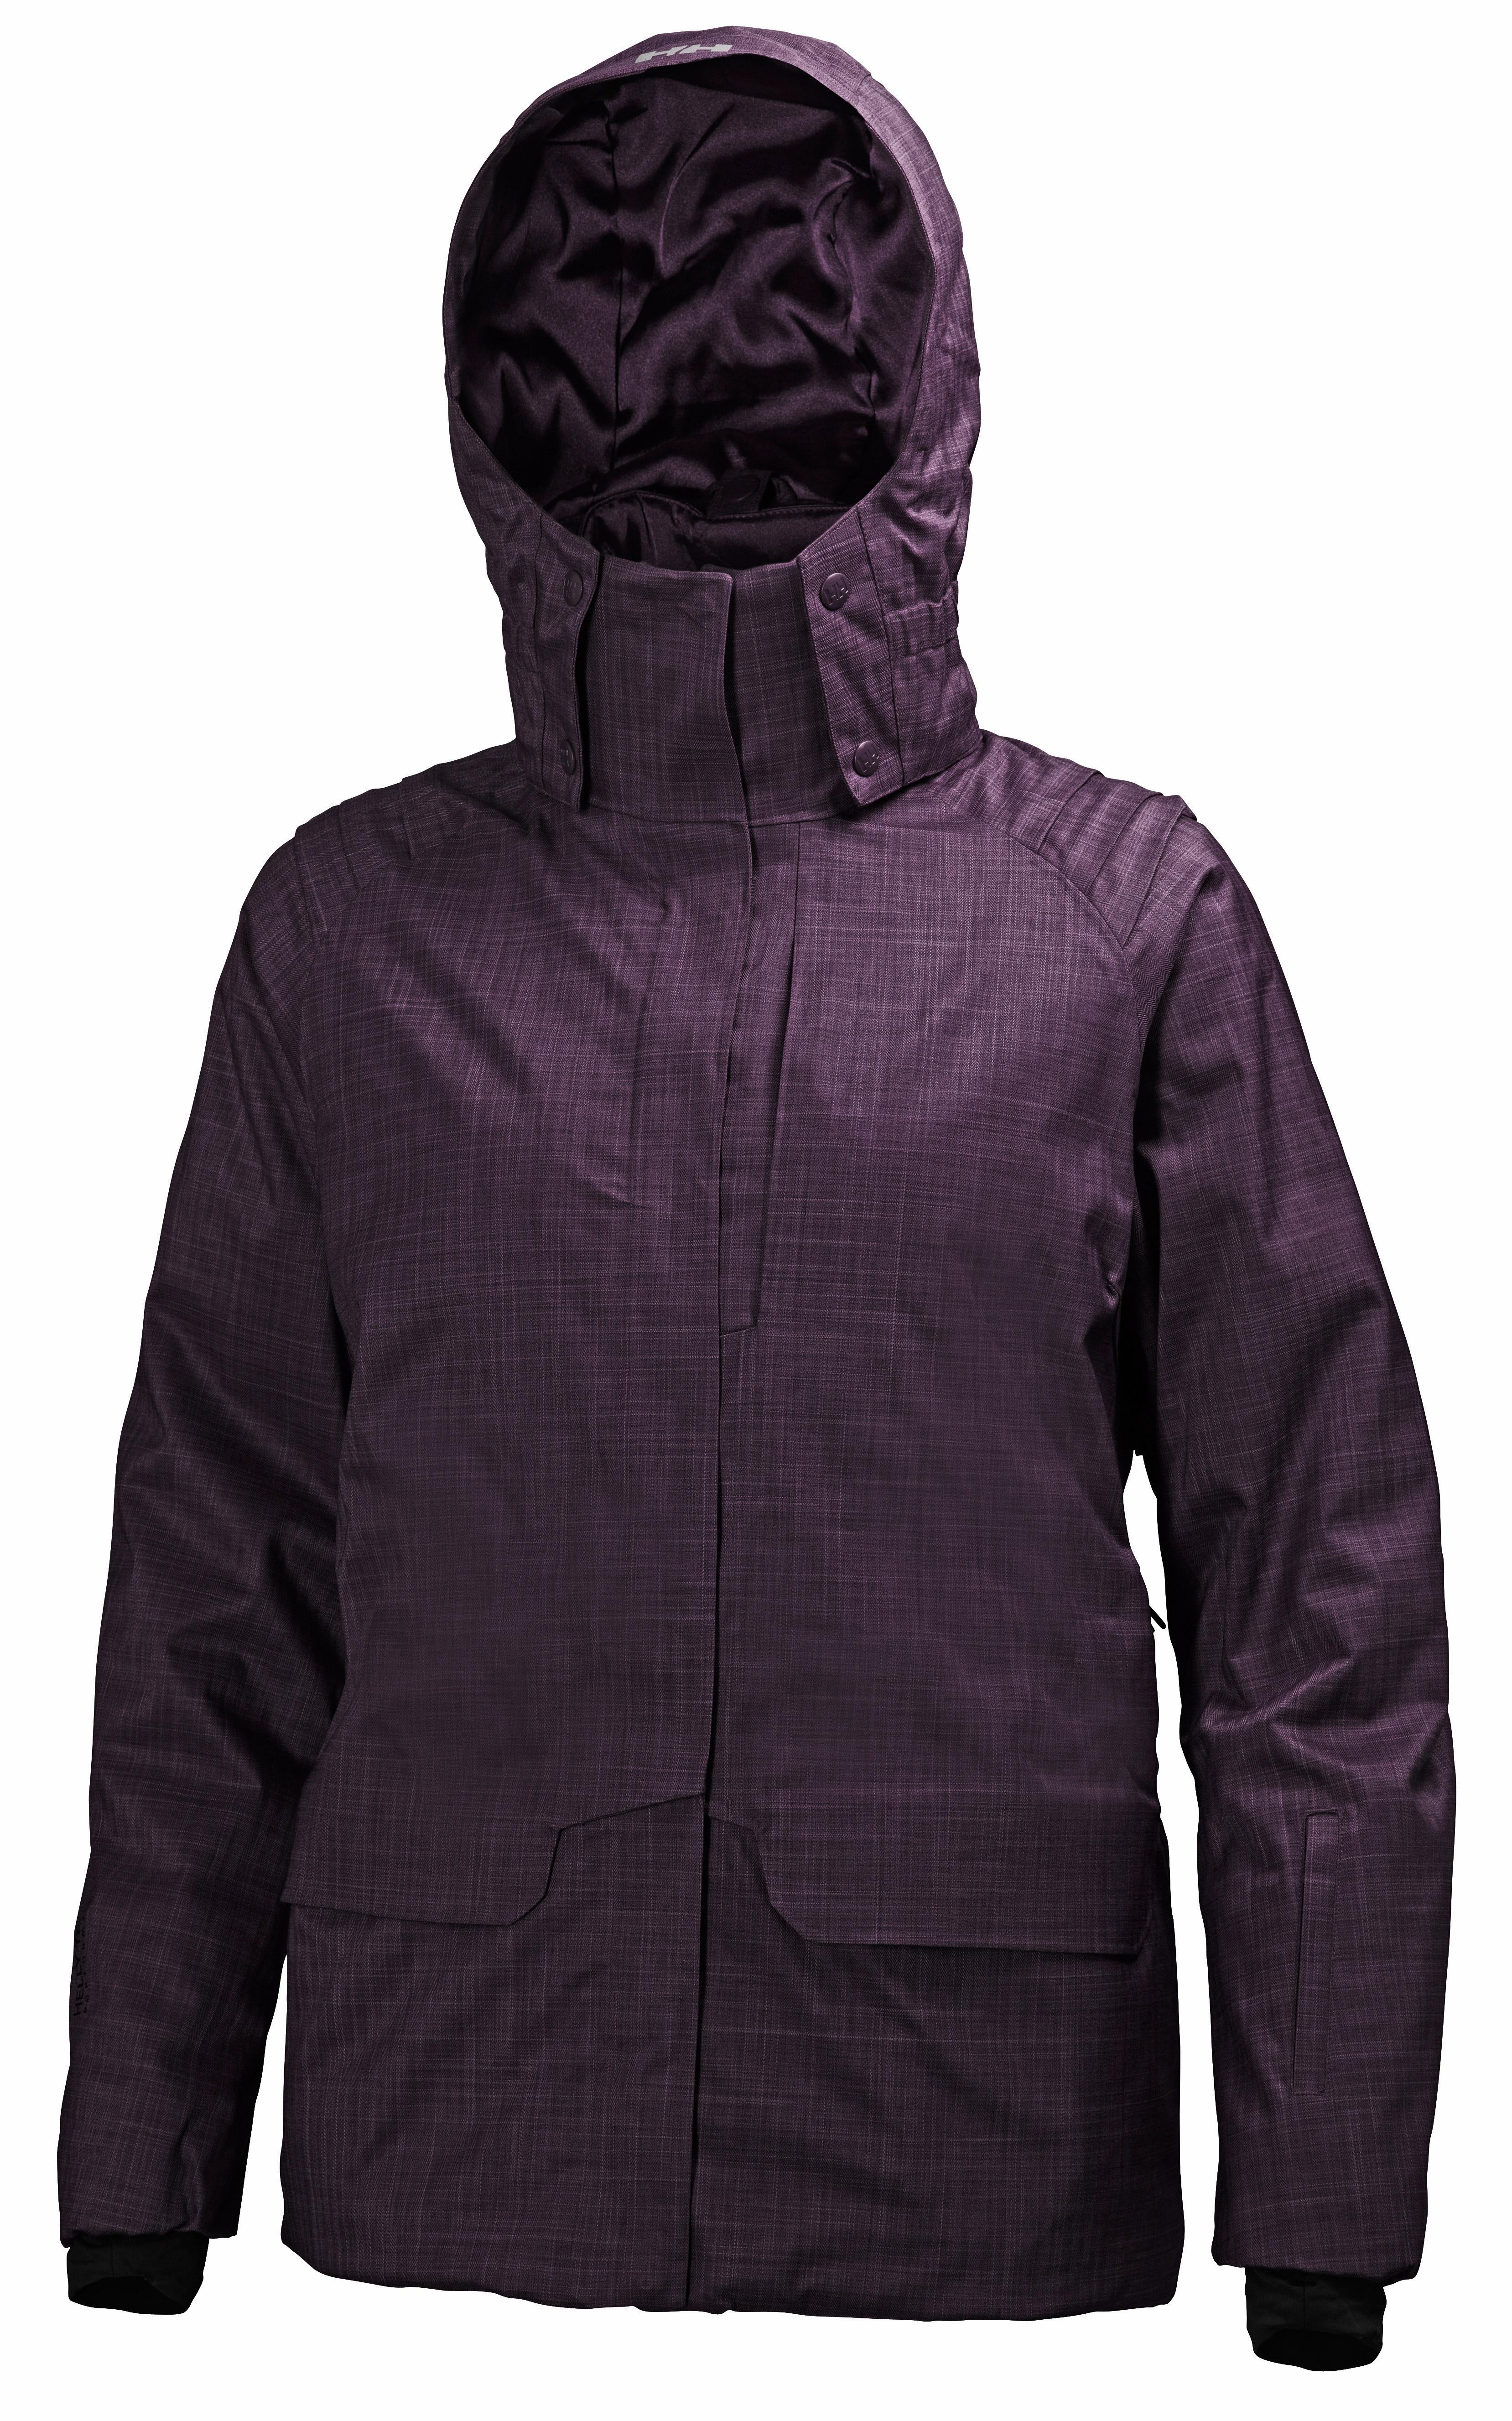 helly hansen blanchette ski jacket womens 2017 mount everest. Black Bedroom Furniture Sets. Home Design Ideas